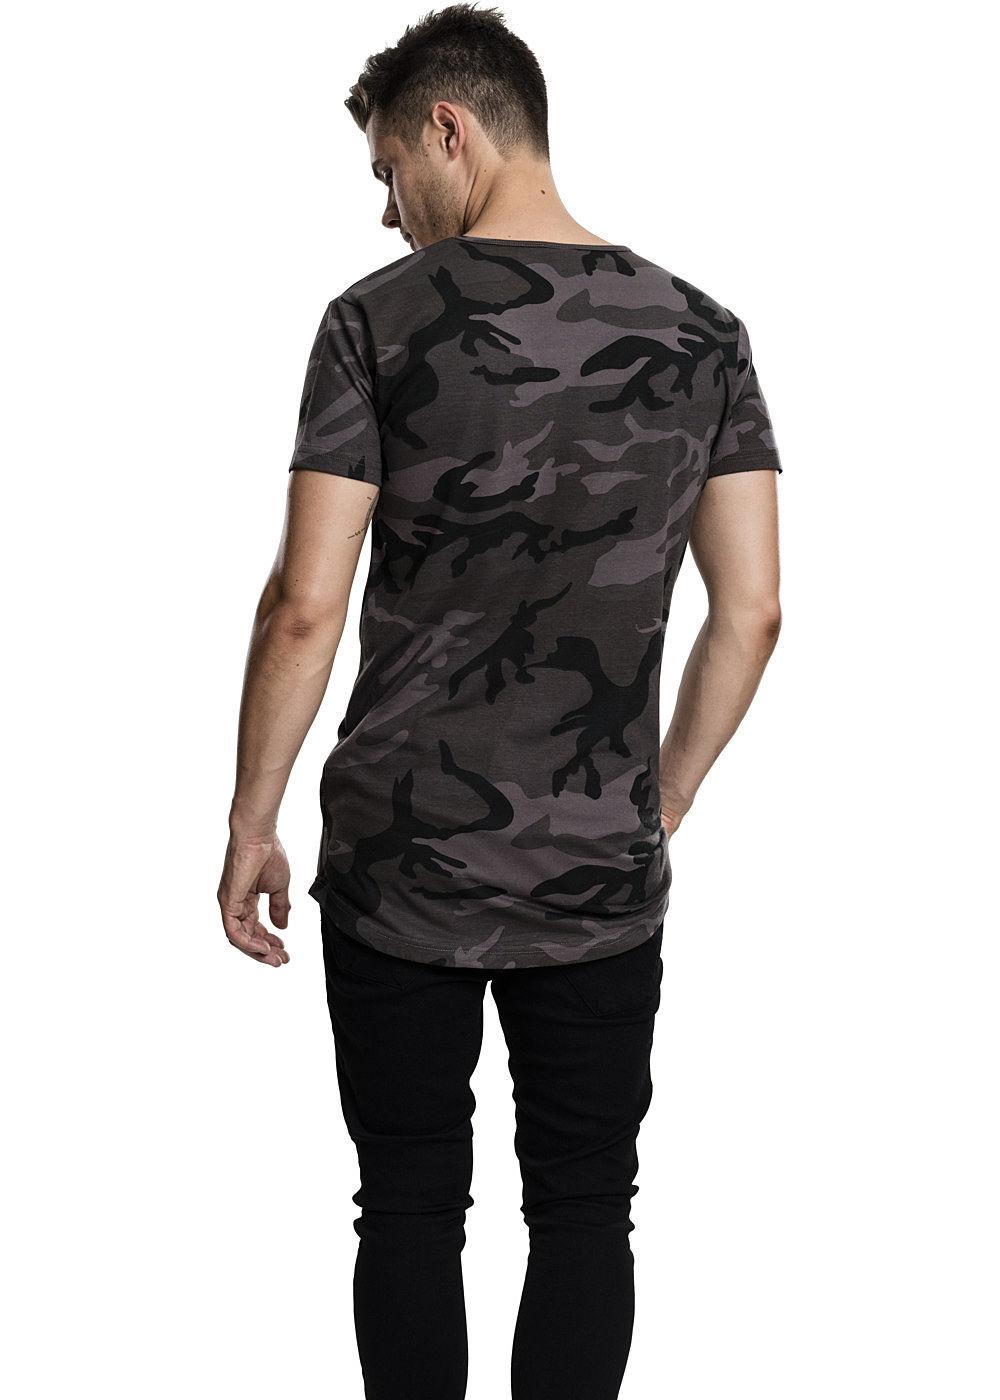 seventyseven lifestyle men t shirt extra langer schnitt allover camo design dark camo 77onlineshop. Black Bedroom Furniture Sets. Home Design Ideas